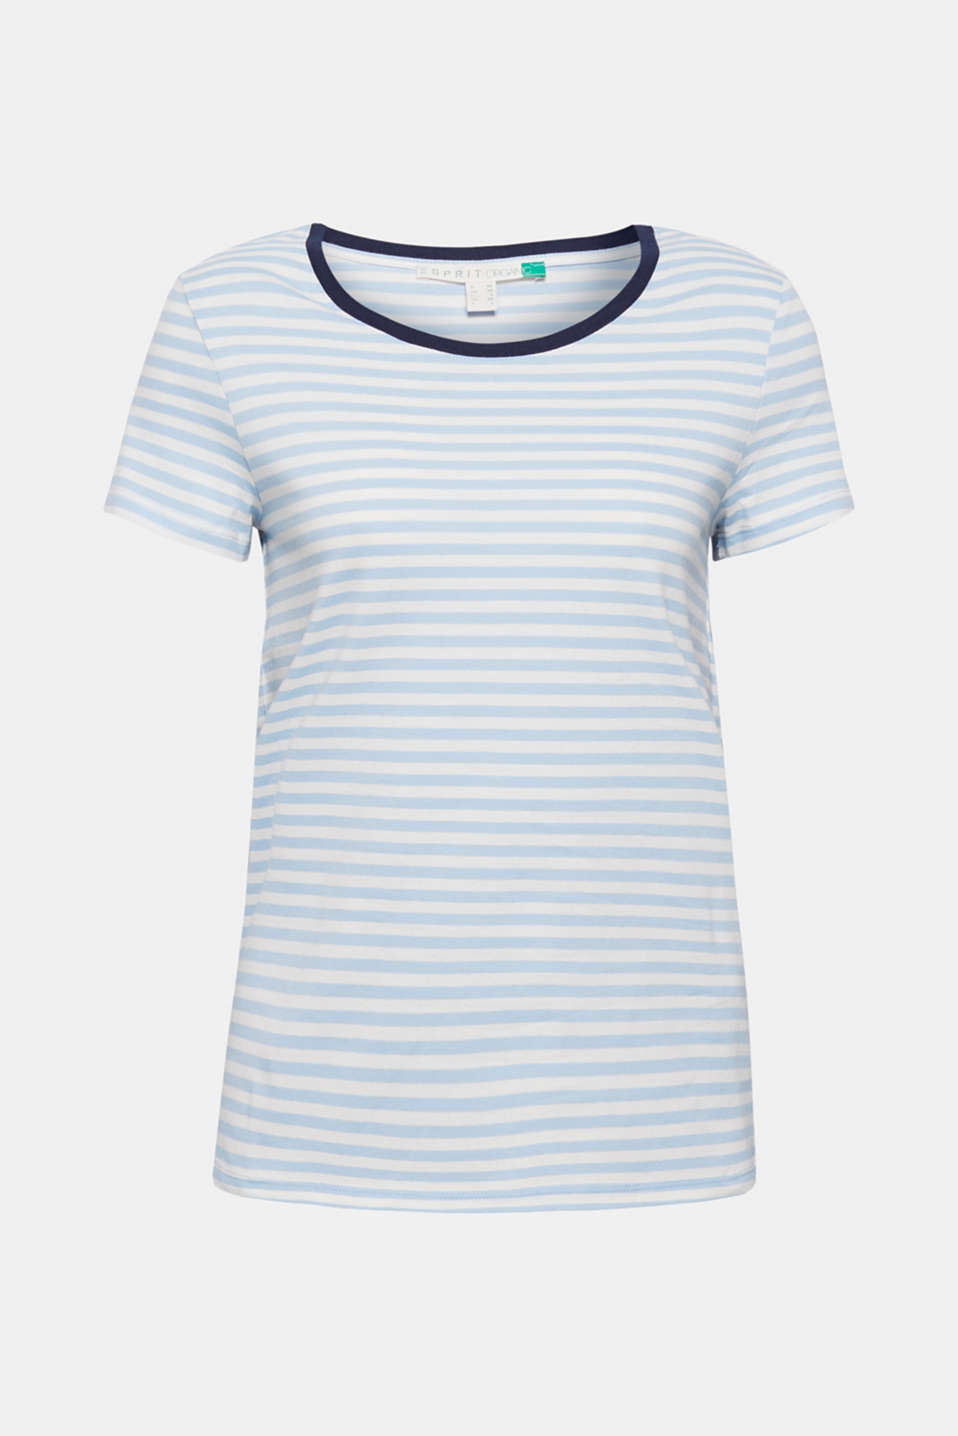 T-Shirts, NAVY, detail image number 6